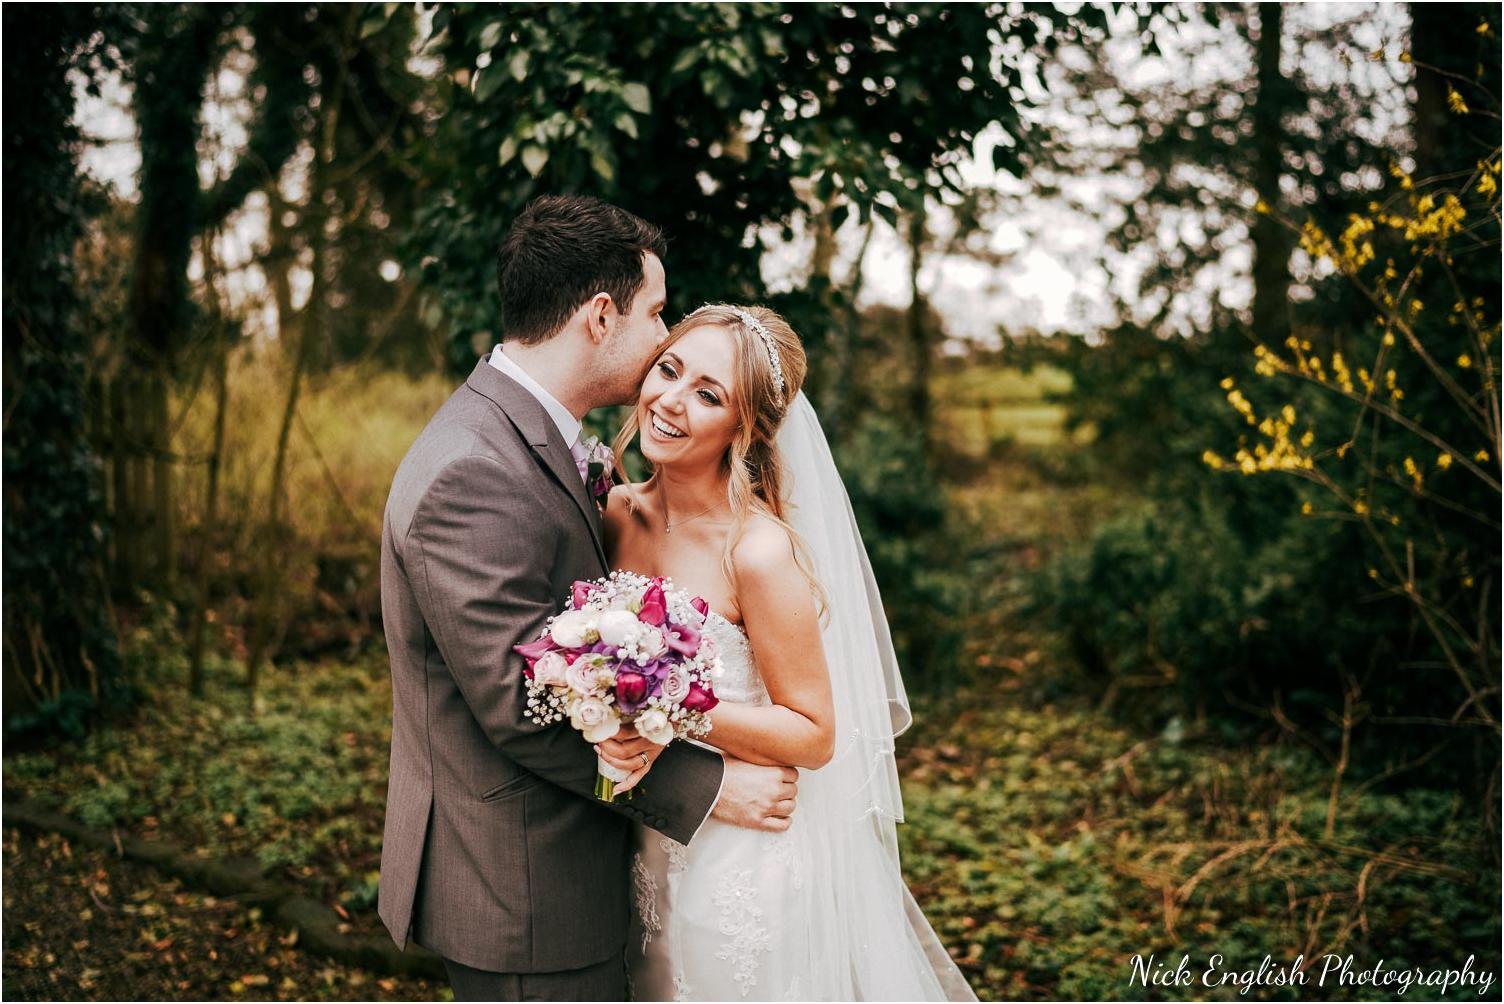 Mitton_Hall_Wedding_Photographer_2018-114.jpg